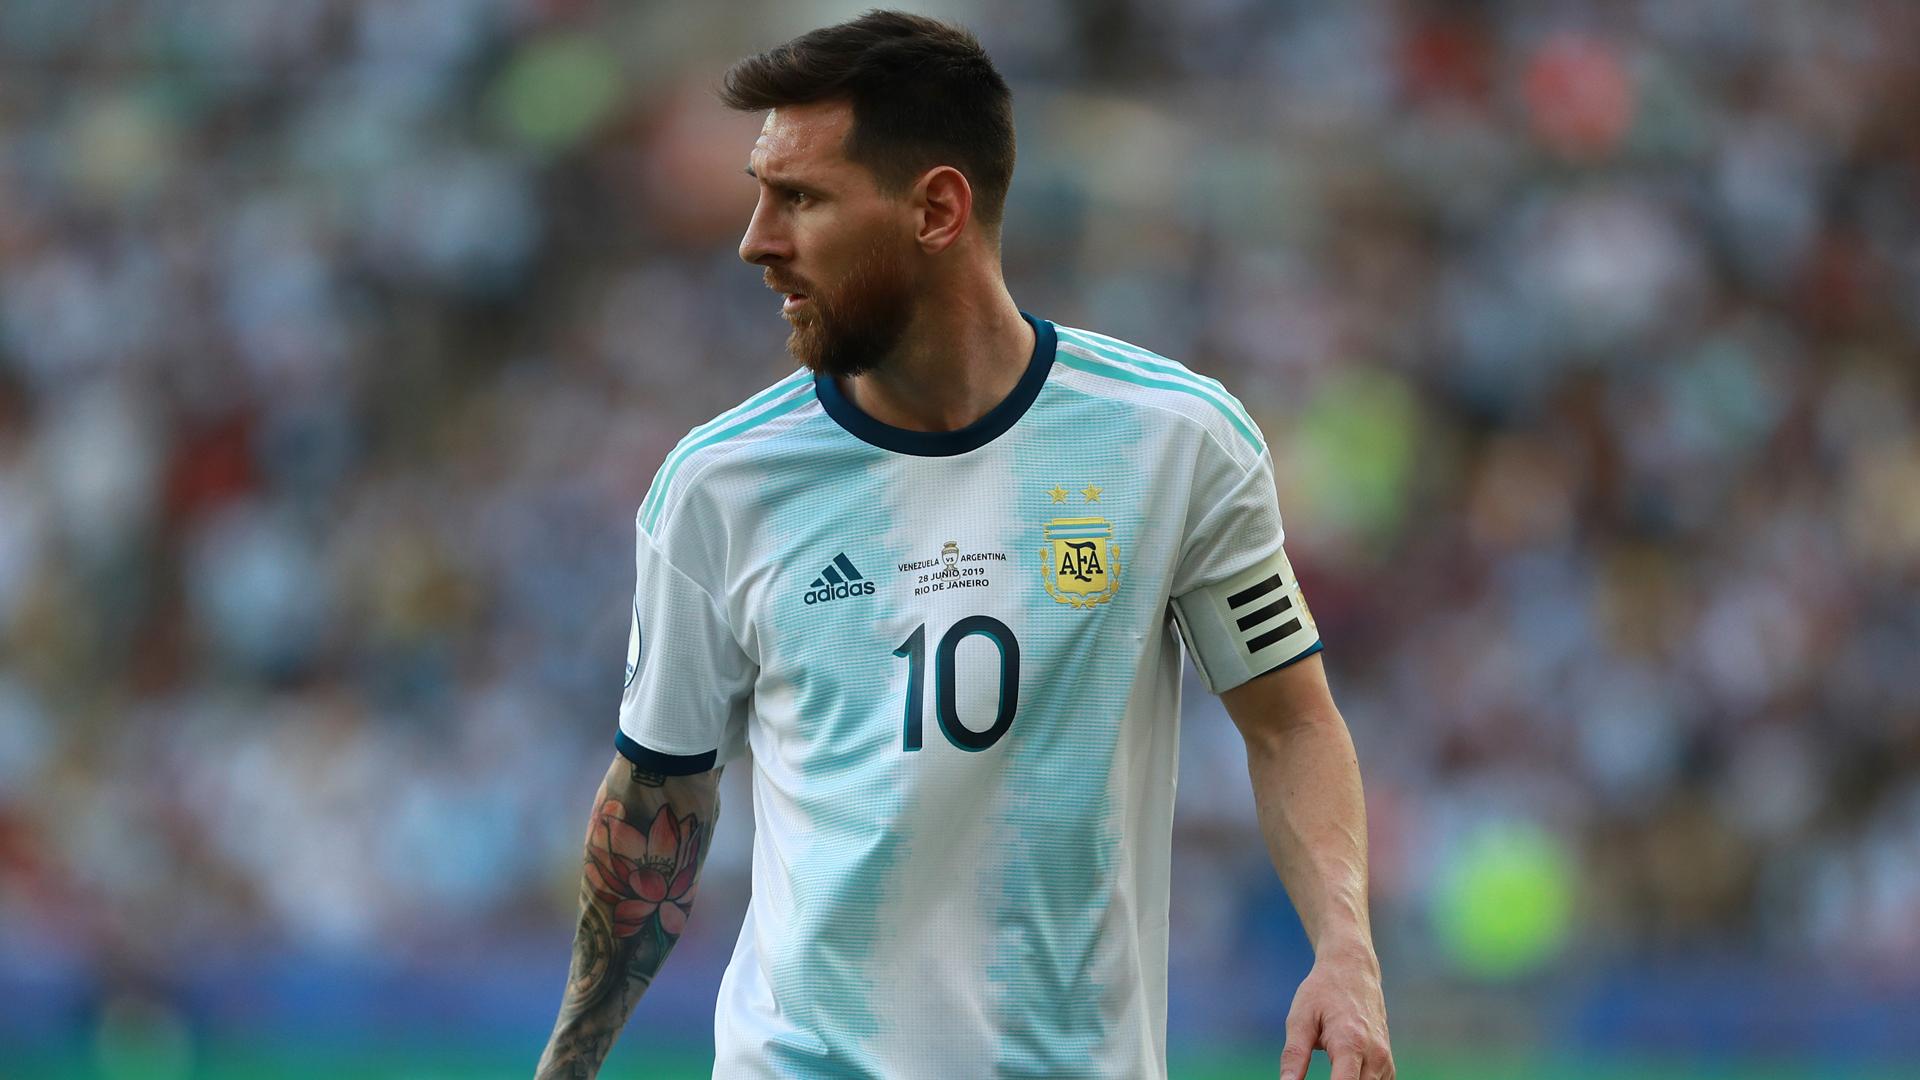 Scaloni backs Argentina 'flag-bearer' Messi